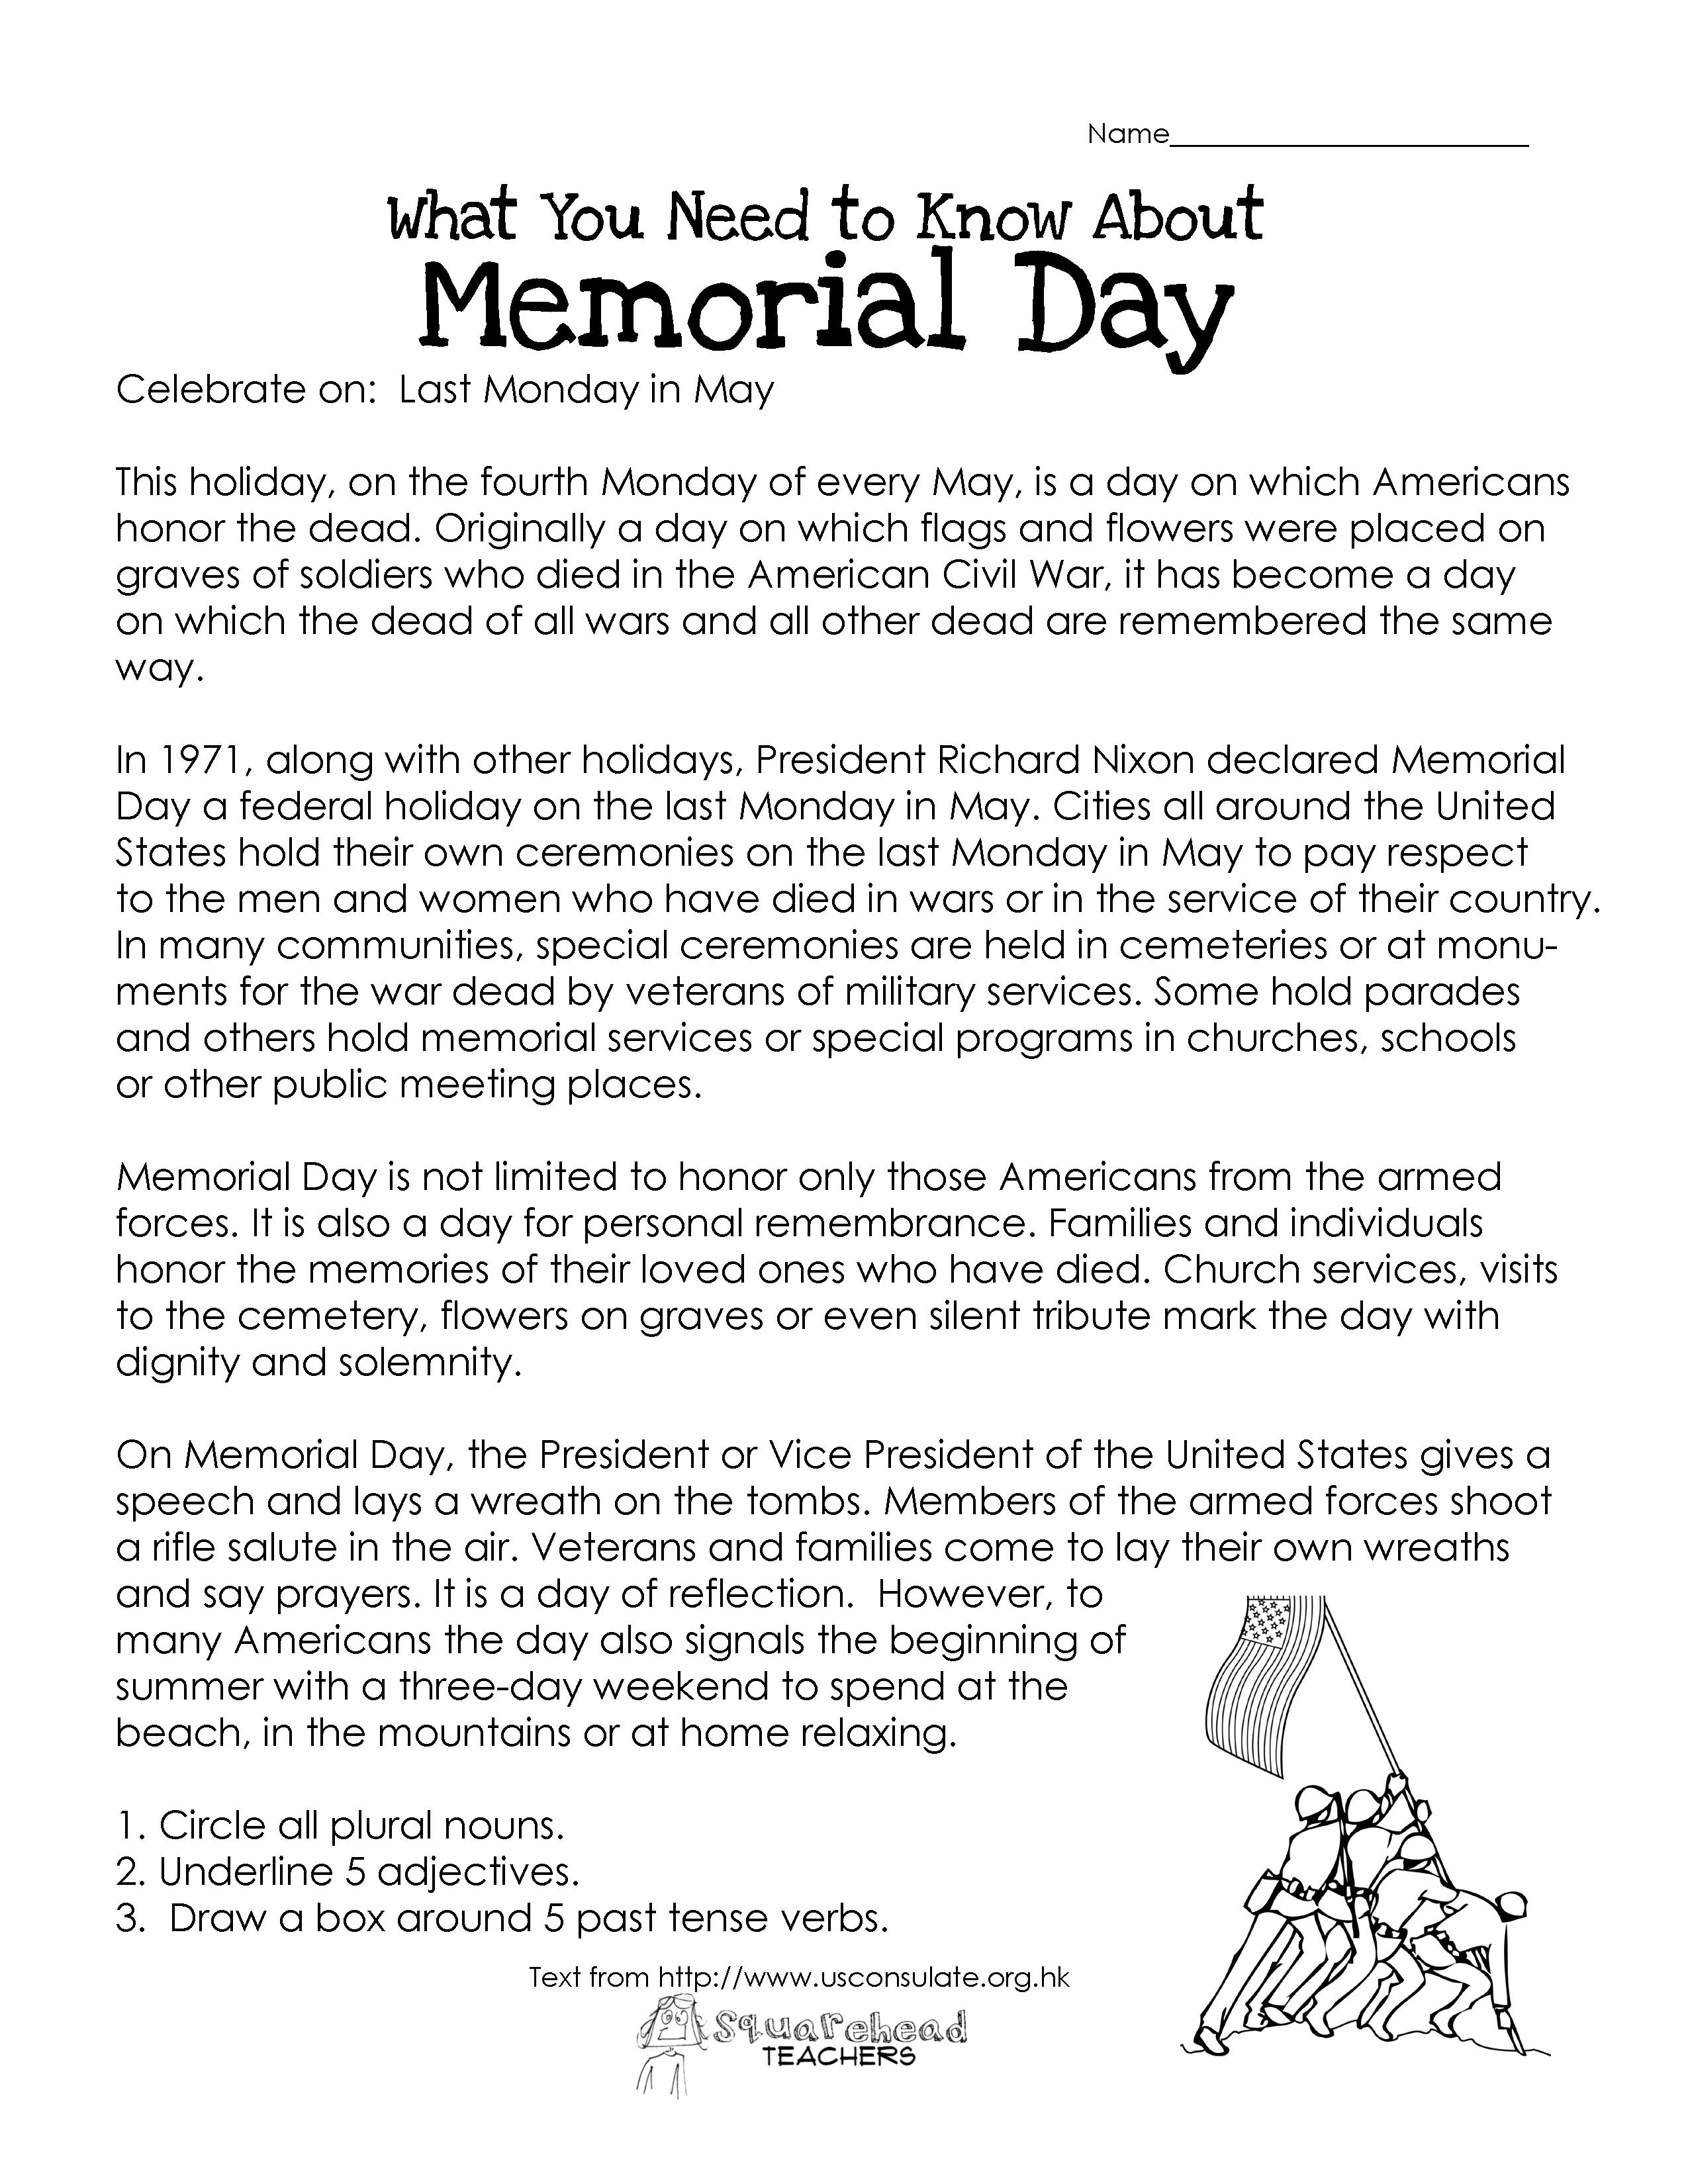 Memorial Day (Free Worksheet) | Squarehead Teachers | Free Printable Labor Day Worksheets